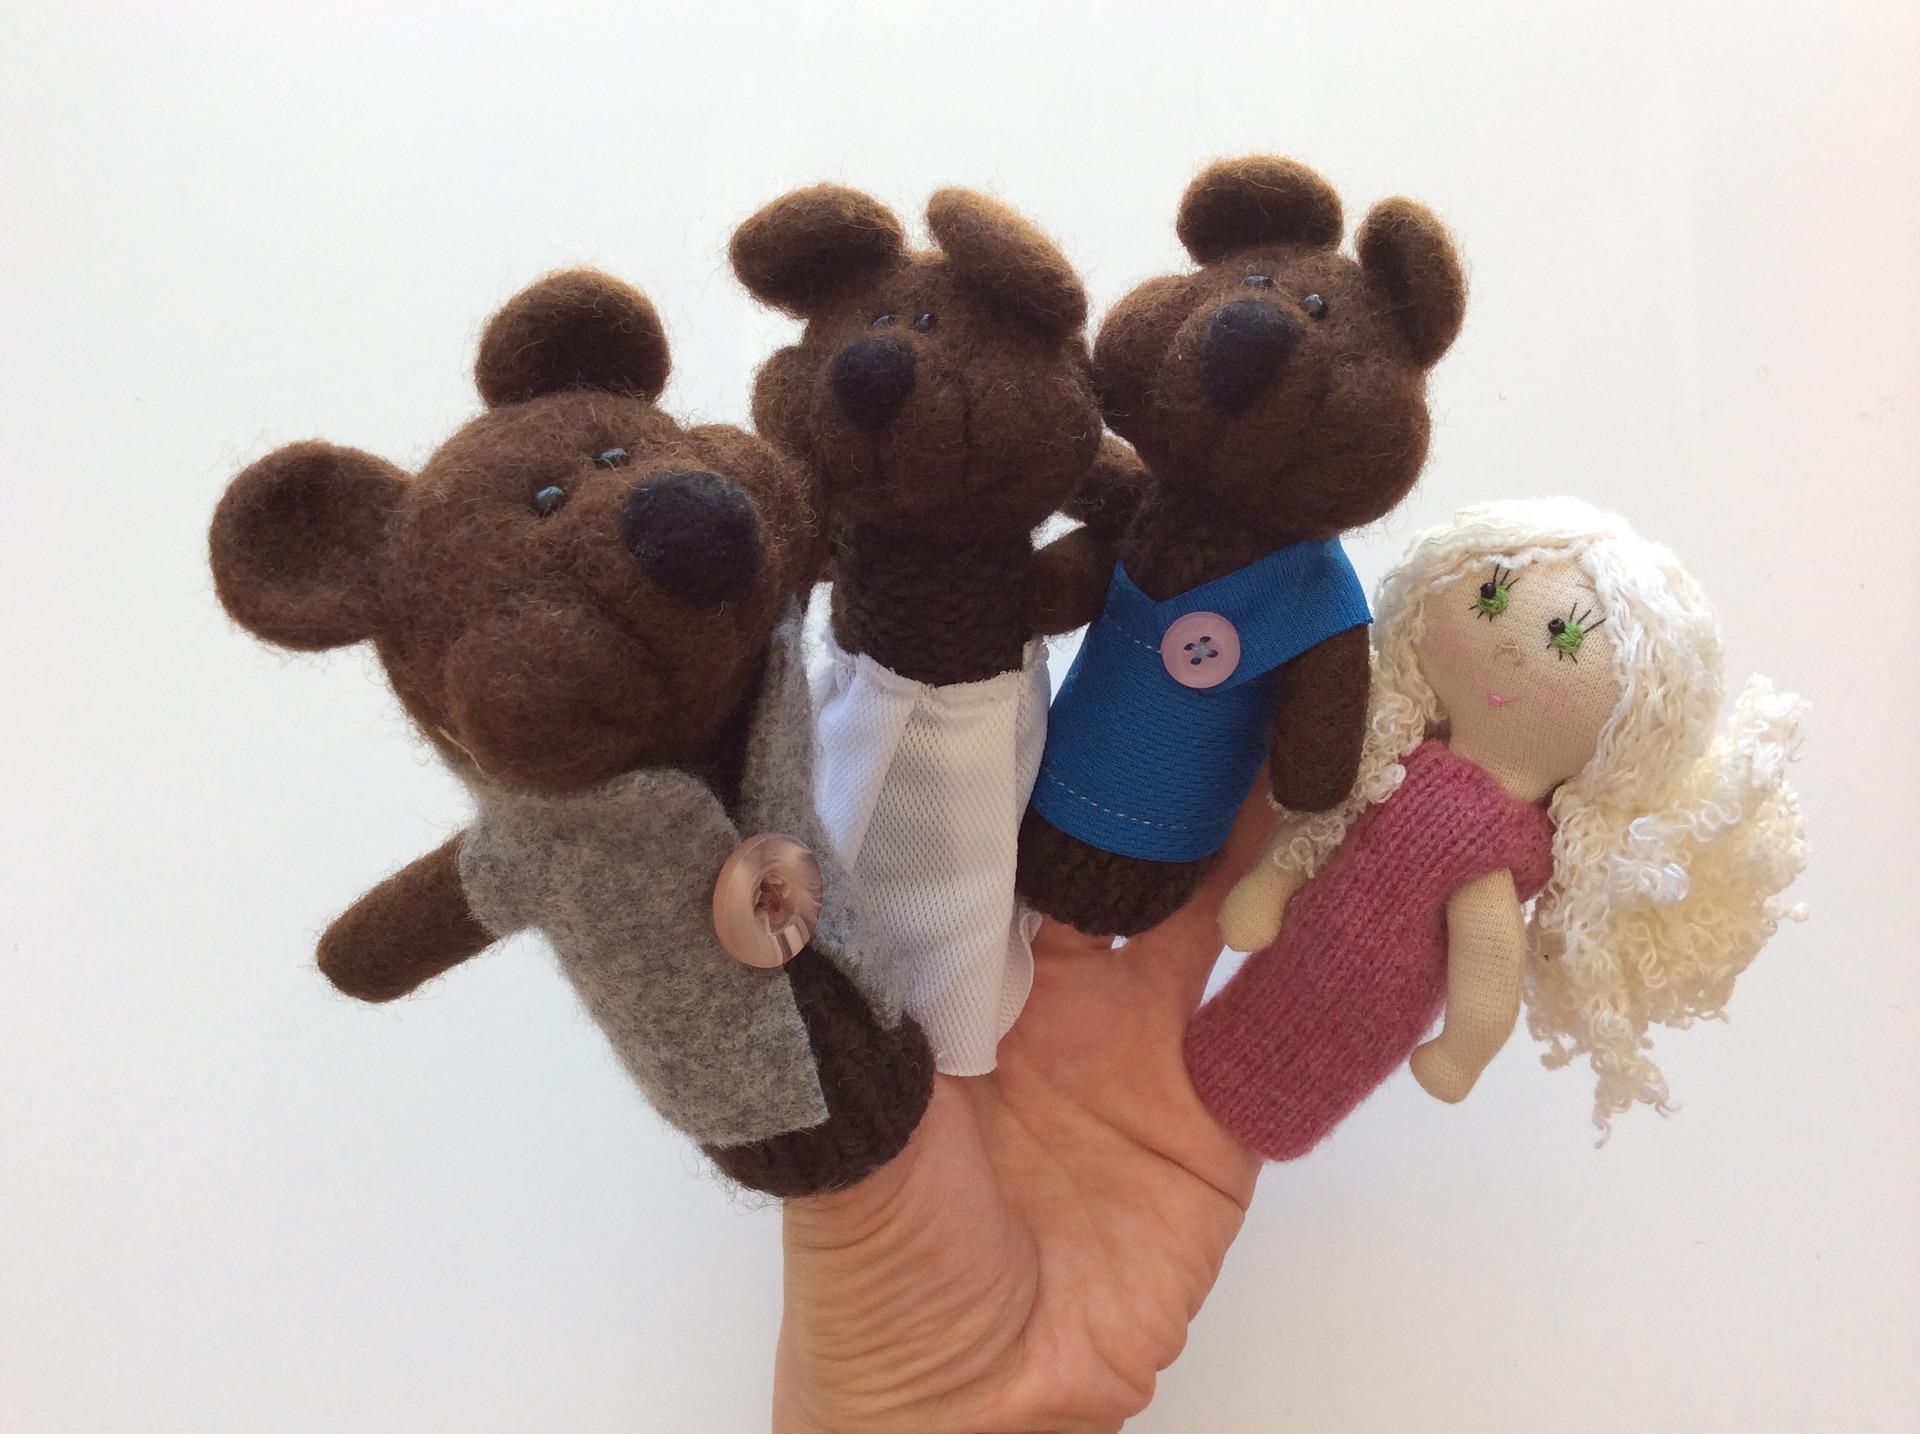 Boucle d'or et trois ours. – OMIKSE